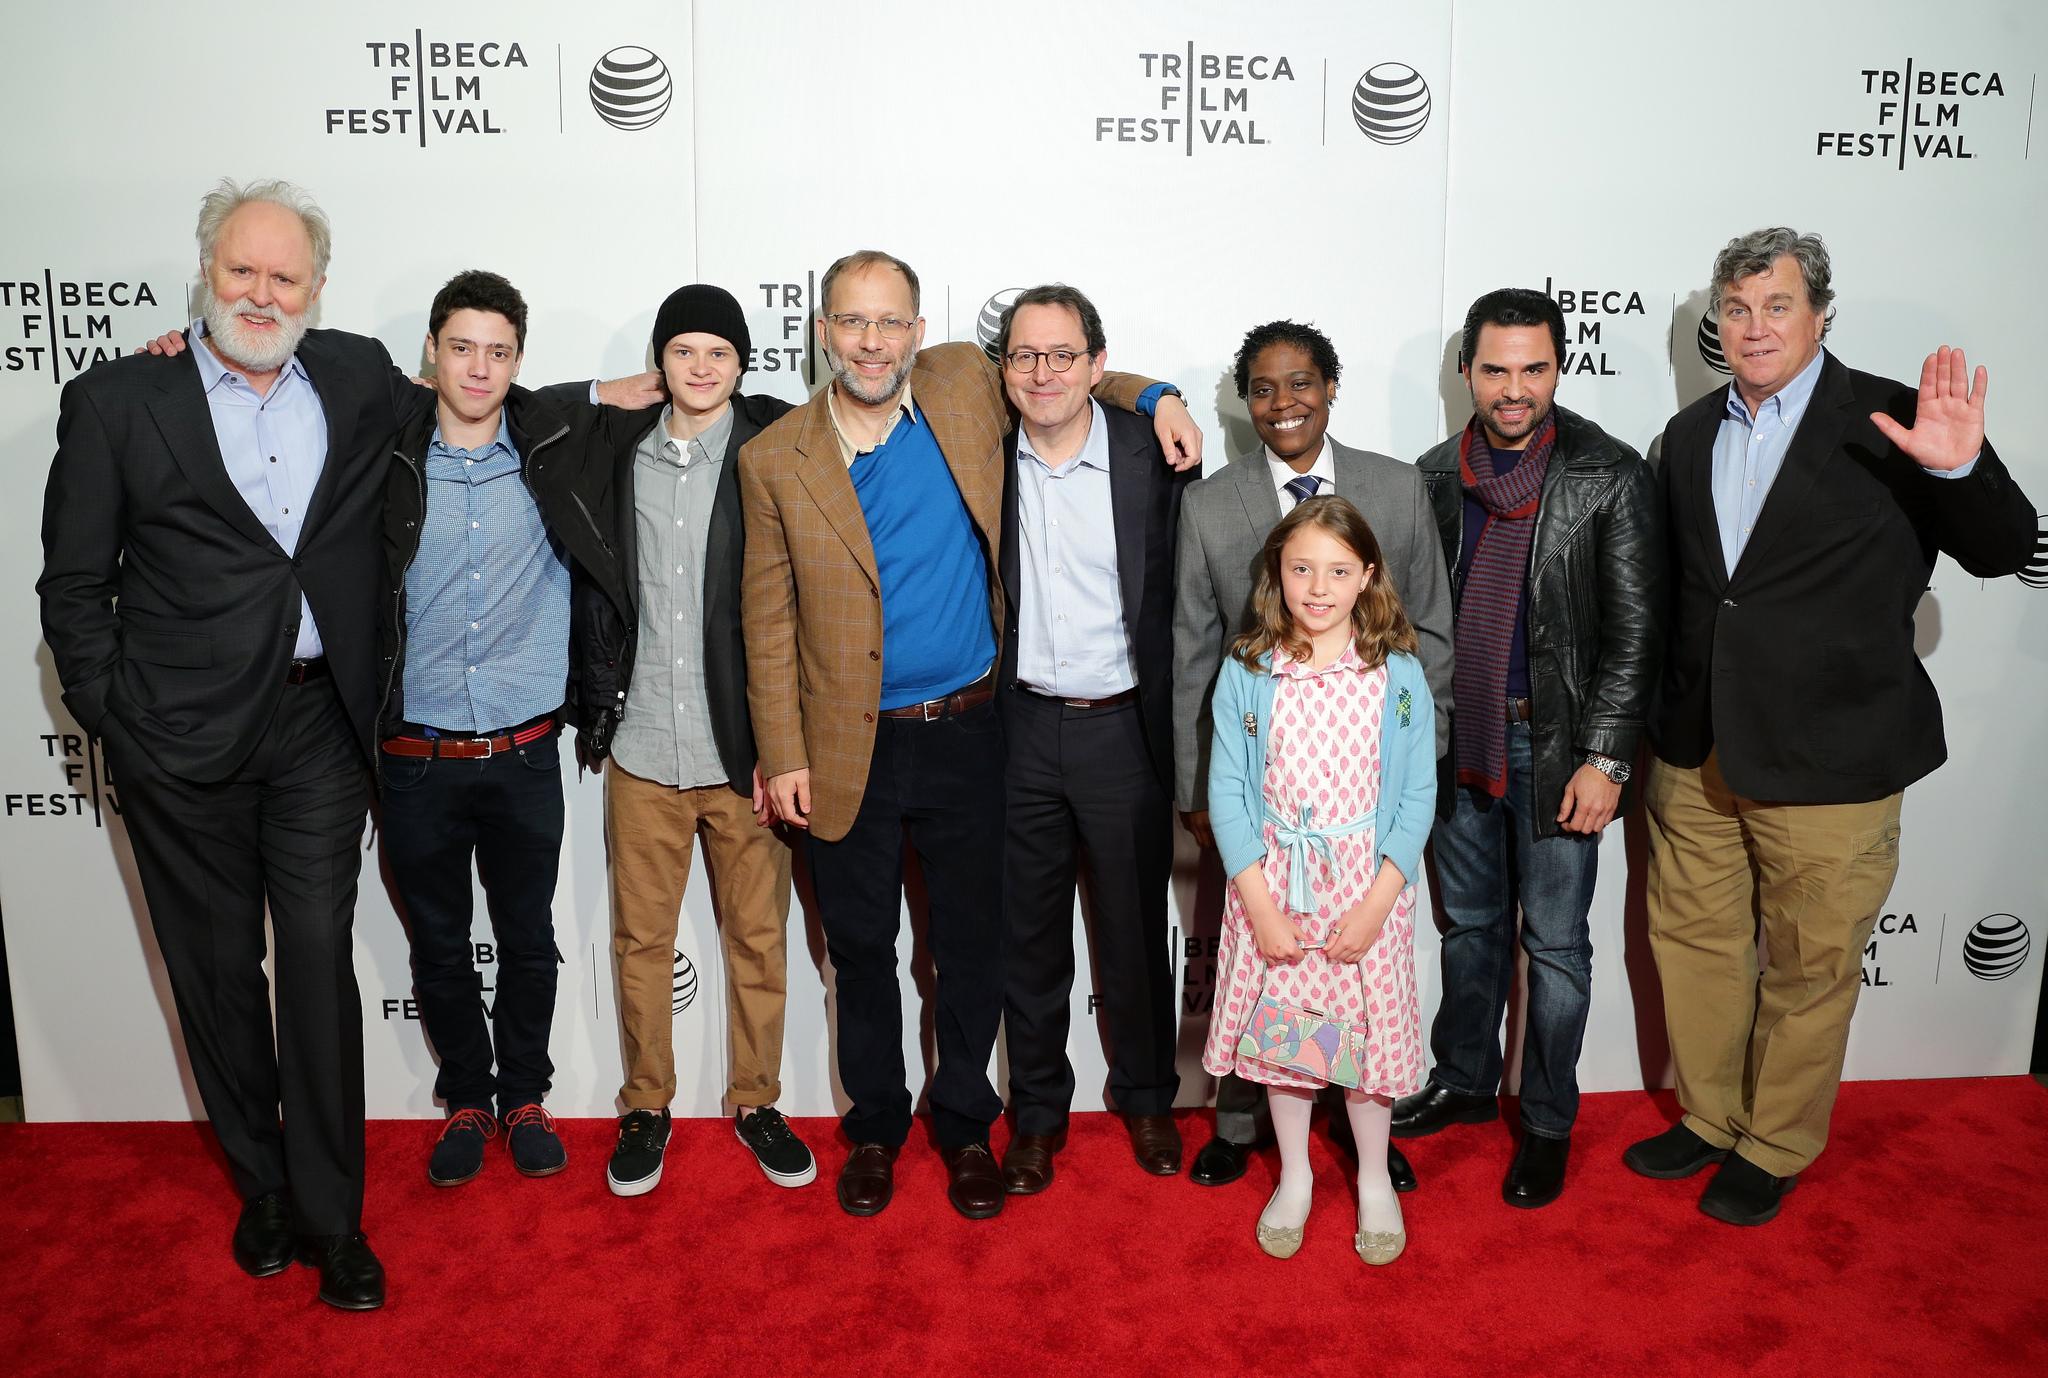 John Lithgow, Manny Perez, Ira Sachs, Michael Barker, Tom Bernard, Charlie Tahan, Tank Burt, Eric Tabach, and Dovie Currin at an event for Love Is Strange (2014)